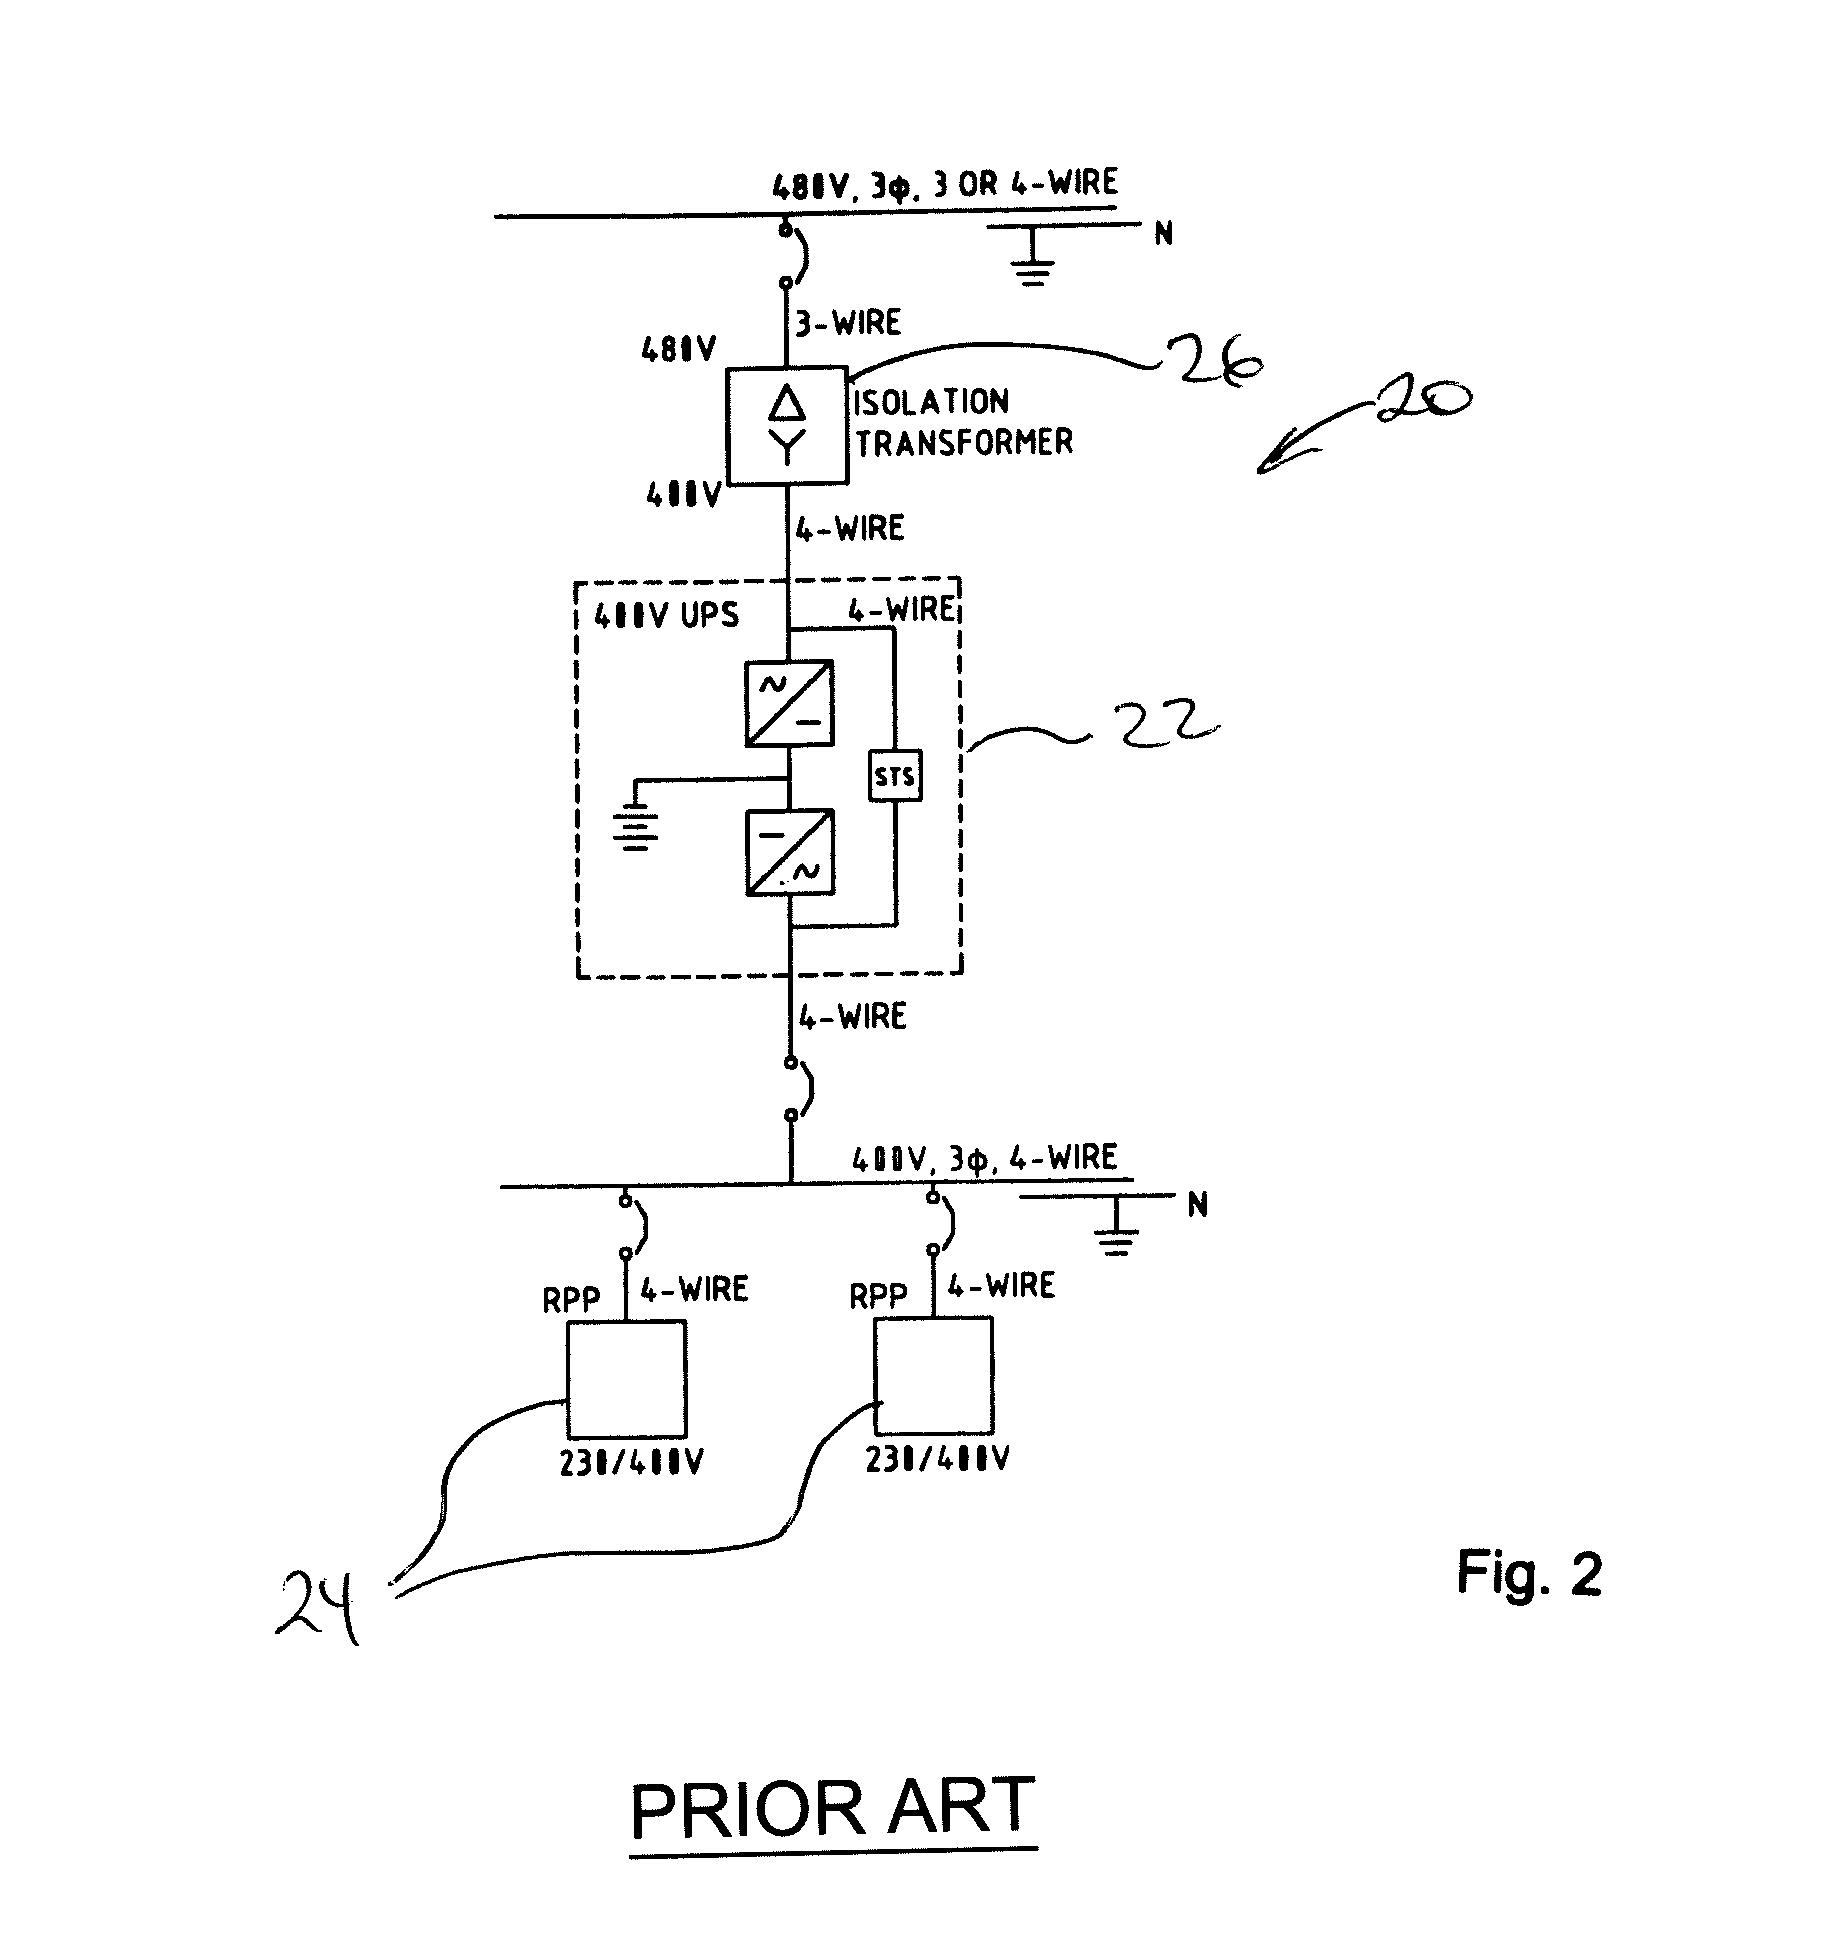 480v step transformer wiring diagram step free printable wiring diagrams